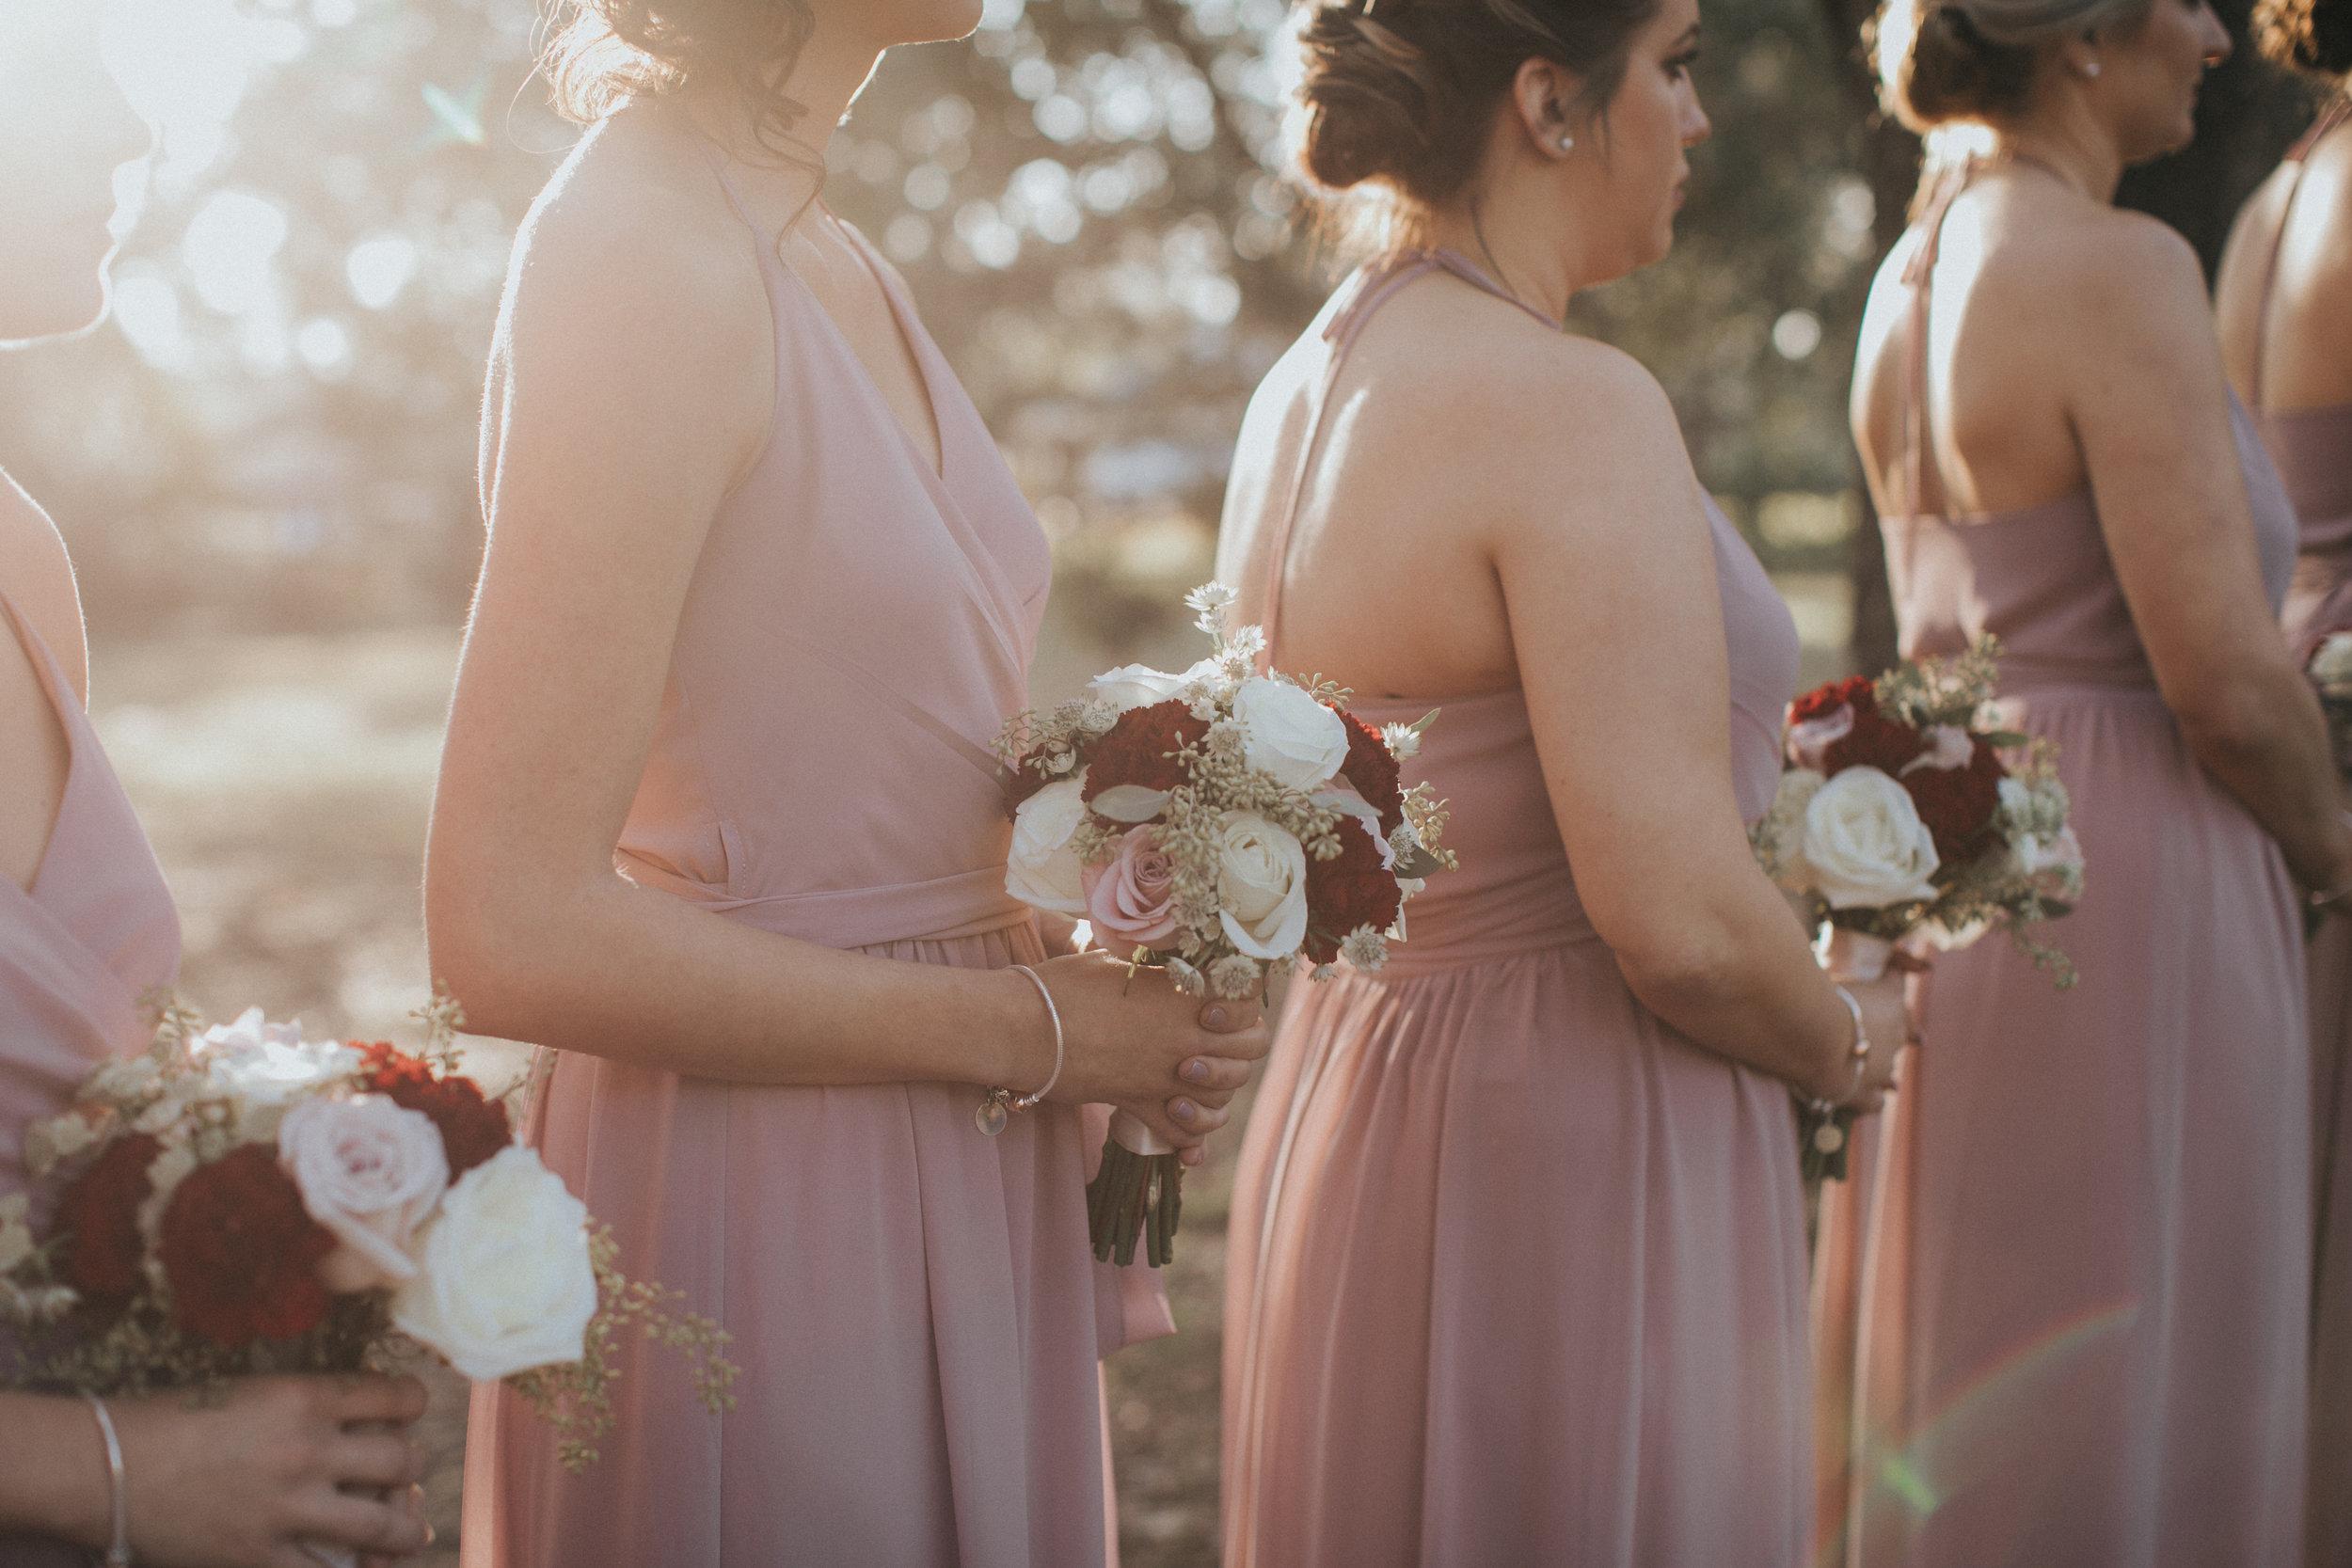 Bella Bridesmaid dresses